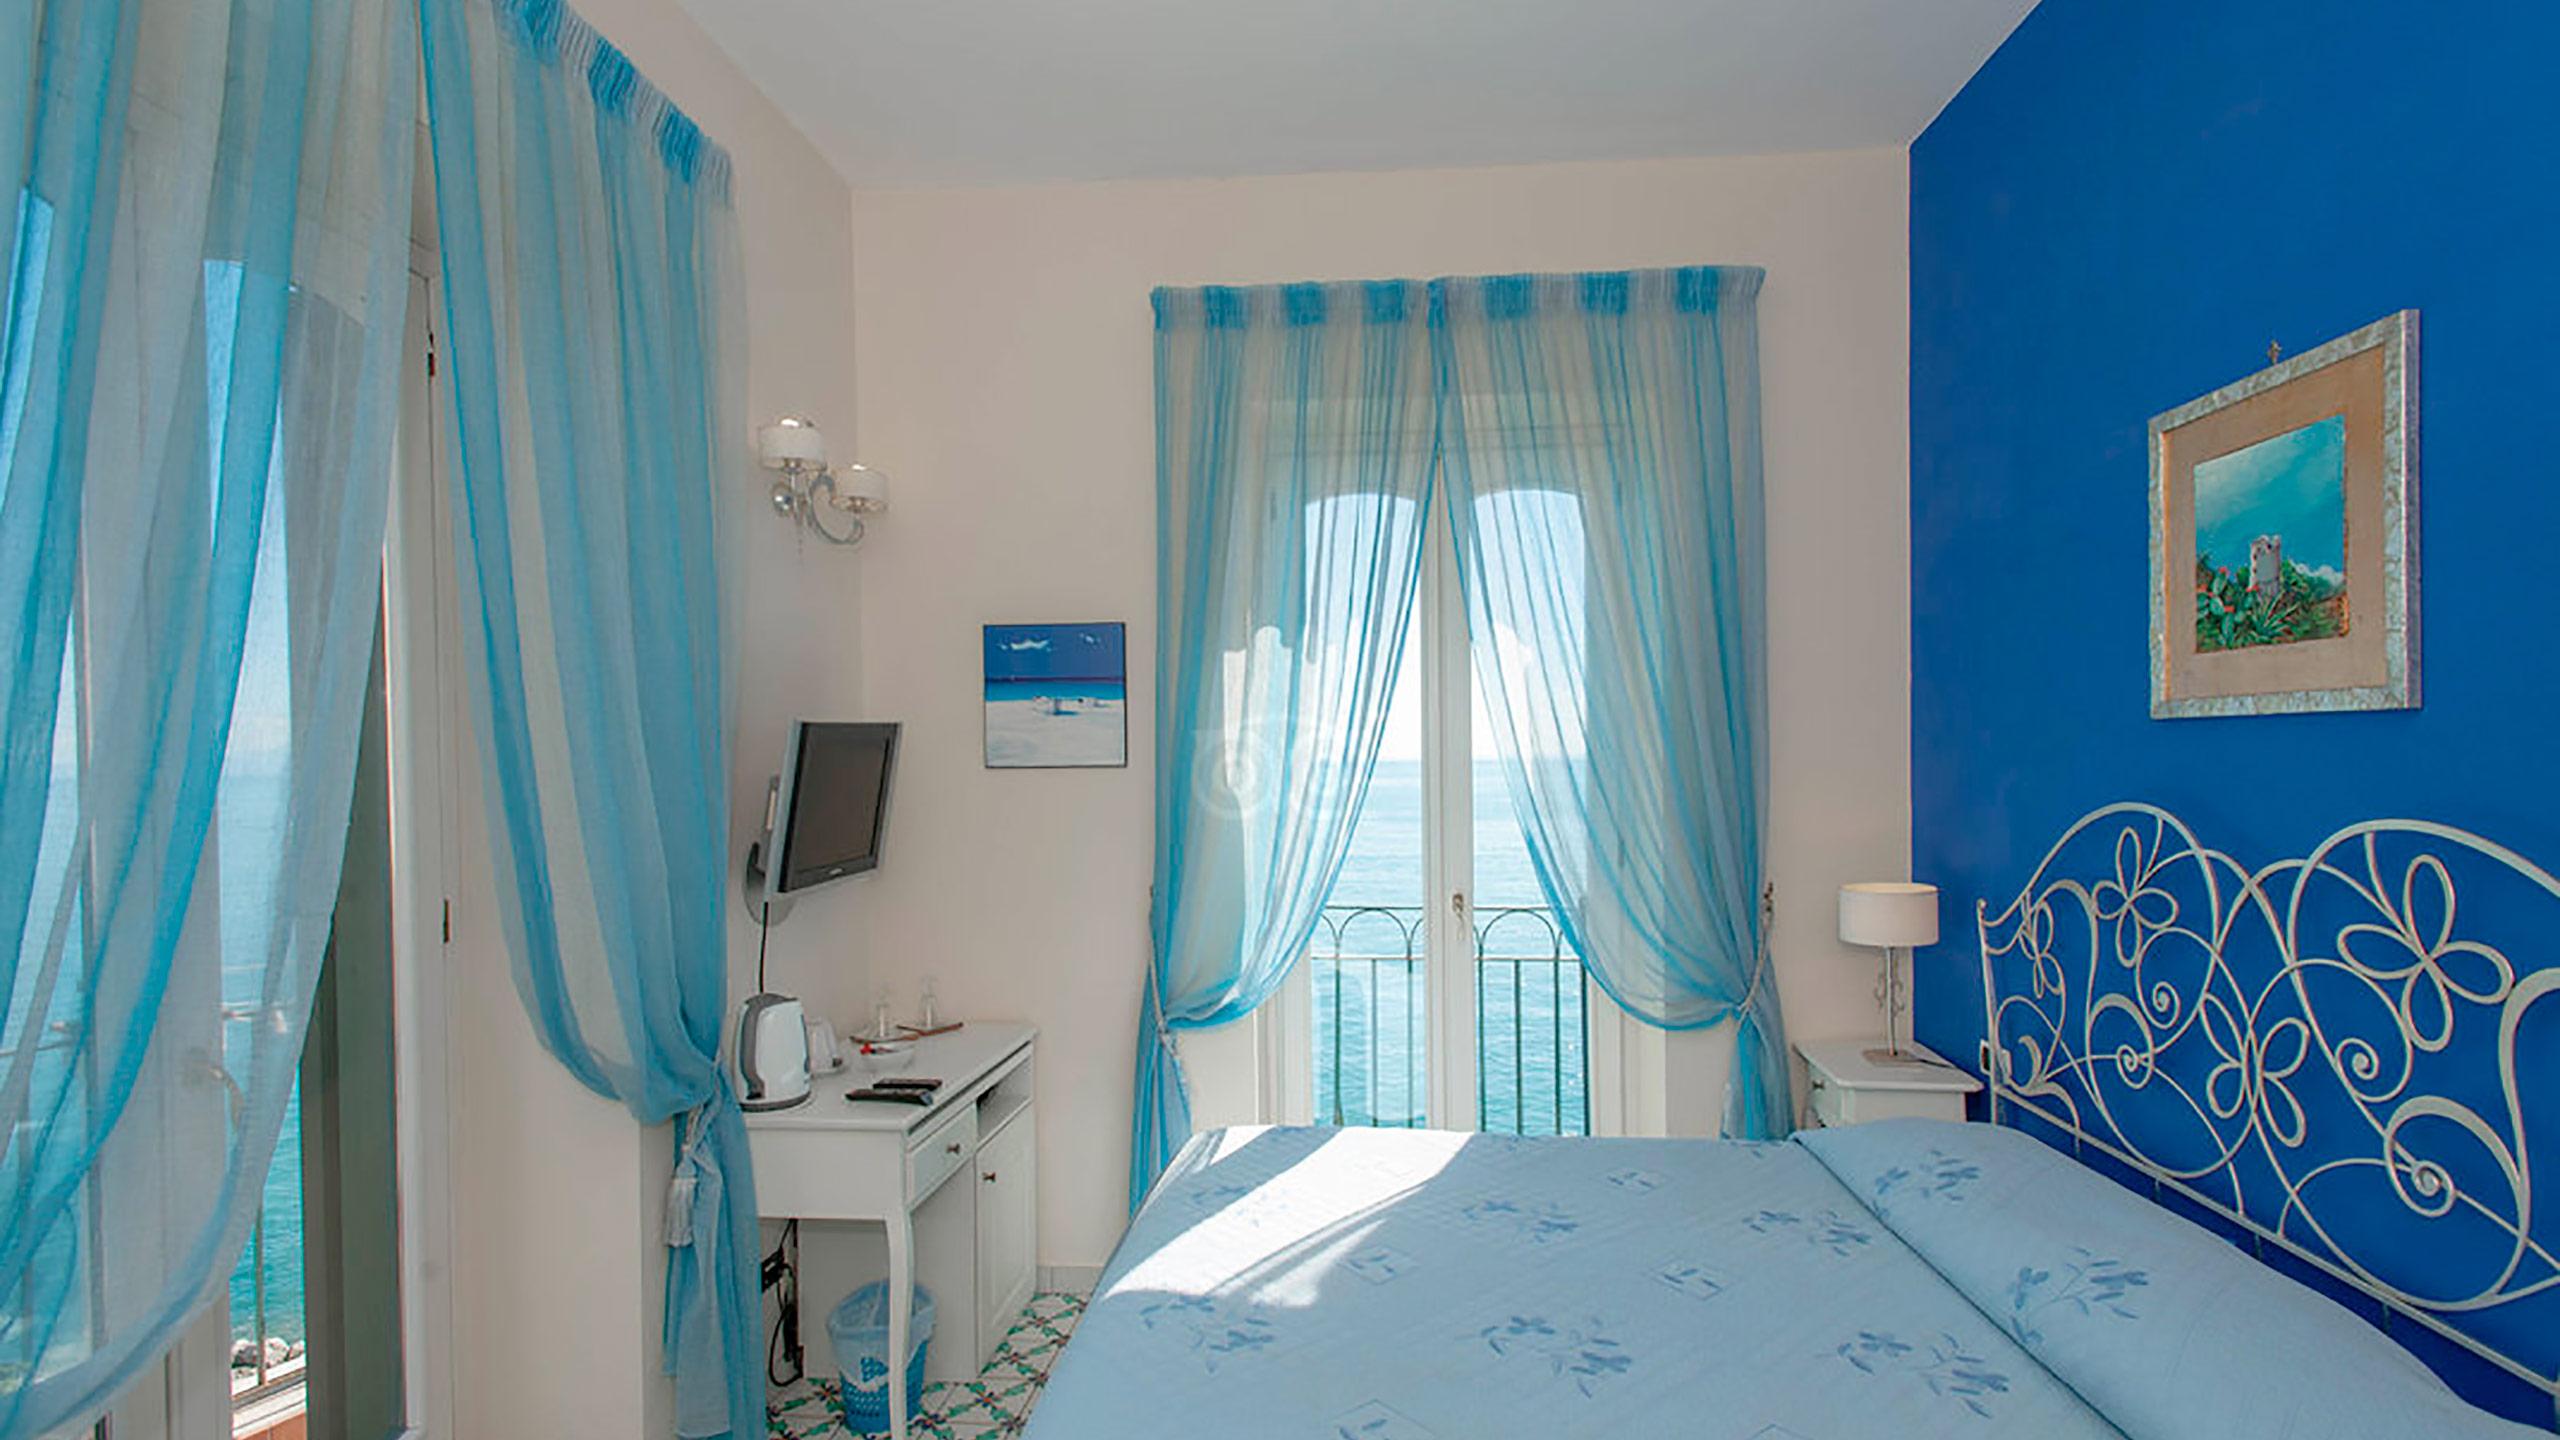 la-rondine-room--v10056931